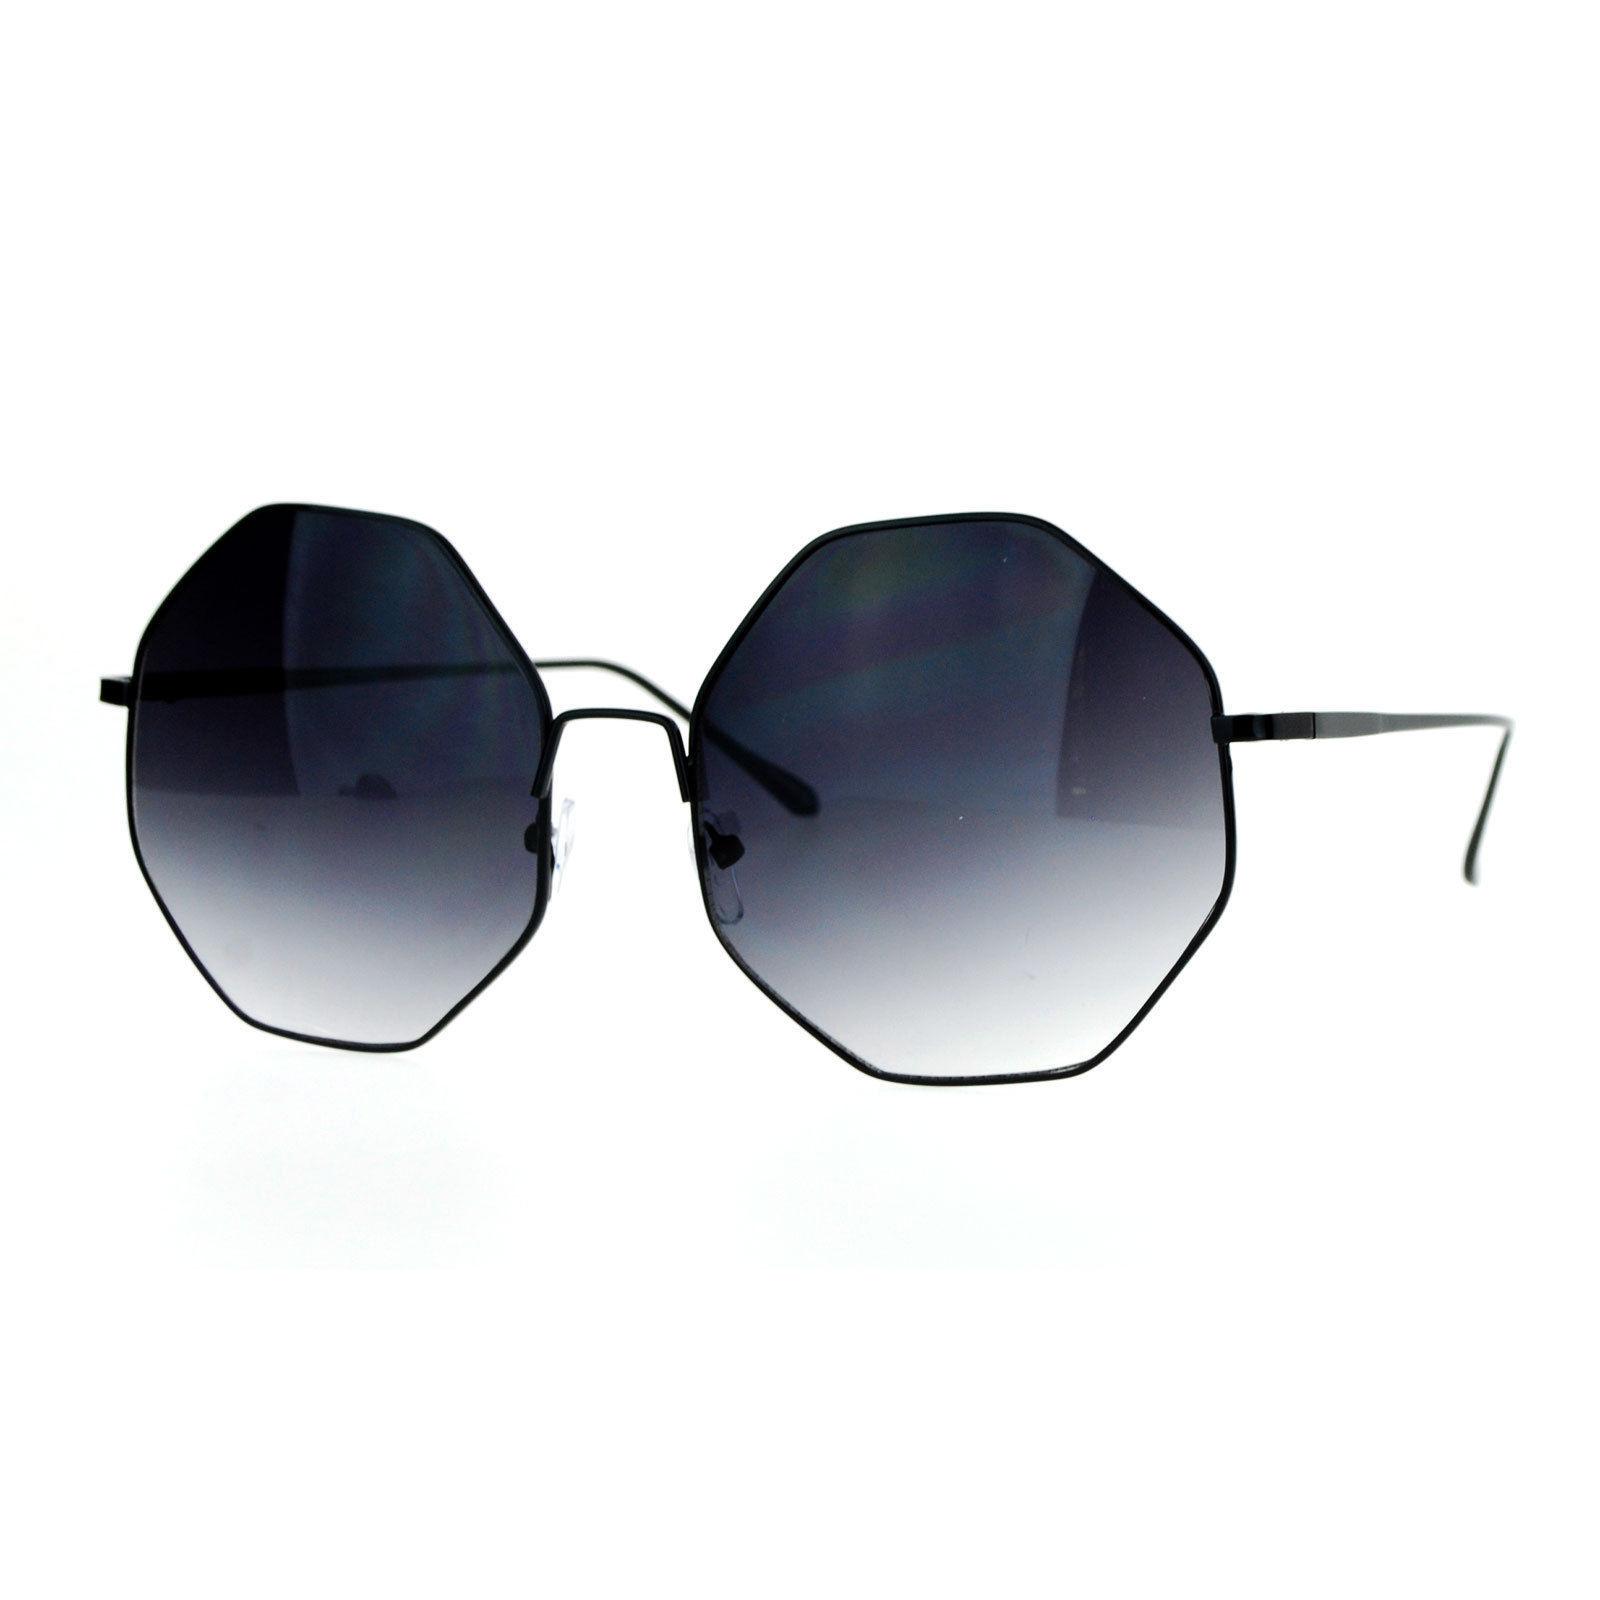 45409d117a09 Octagon Shape Metal Frame Sunglasses Womens New Fashion Eyewear UV400